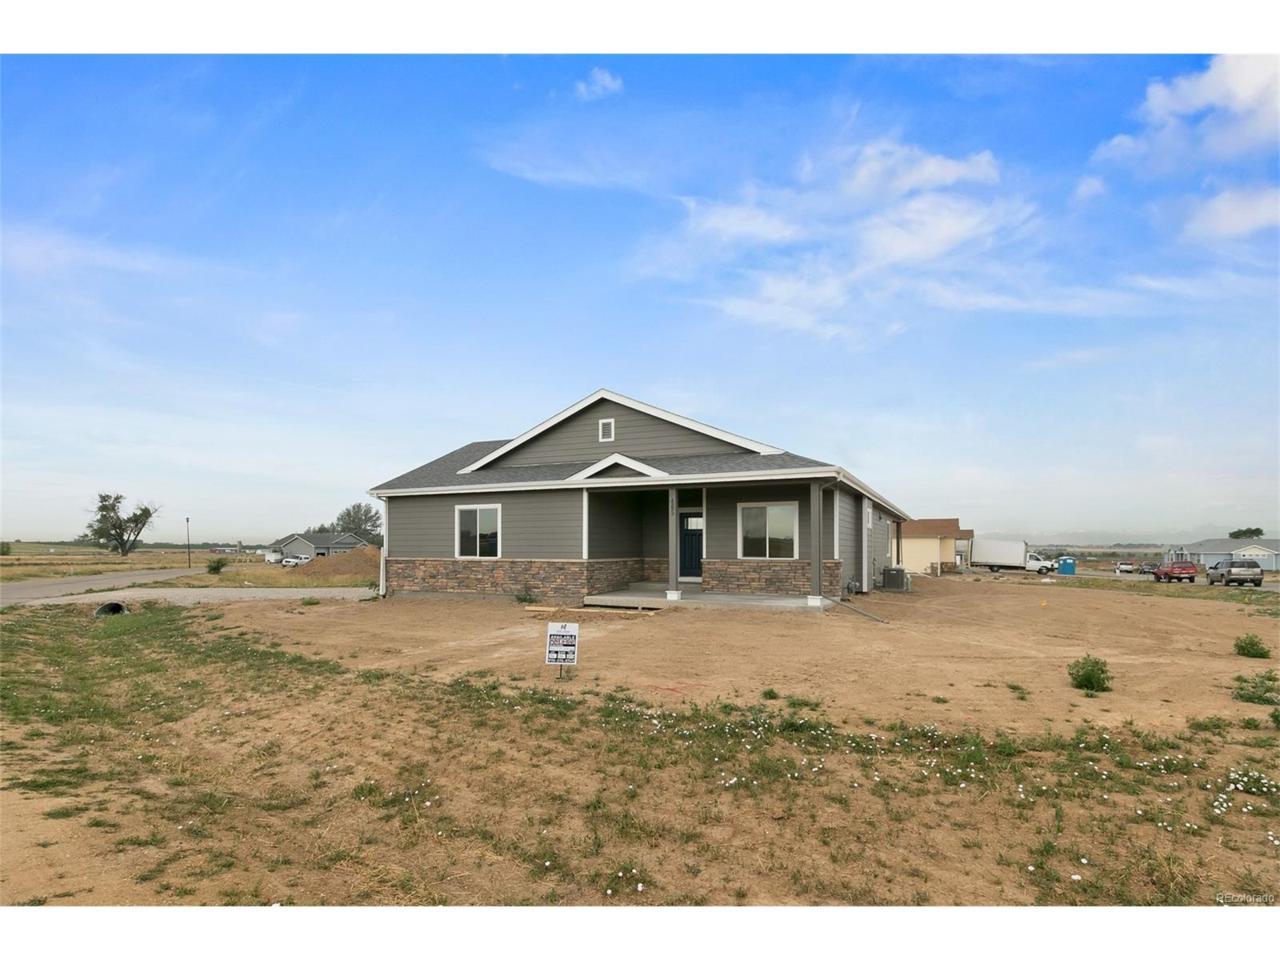 465 Wyatt Drive, Hudson, CO 80642 (MLS #2613176) :: 8z Real Estate